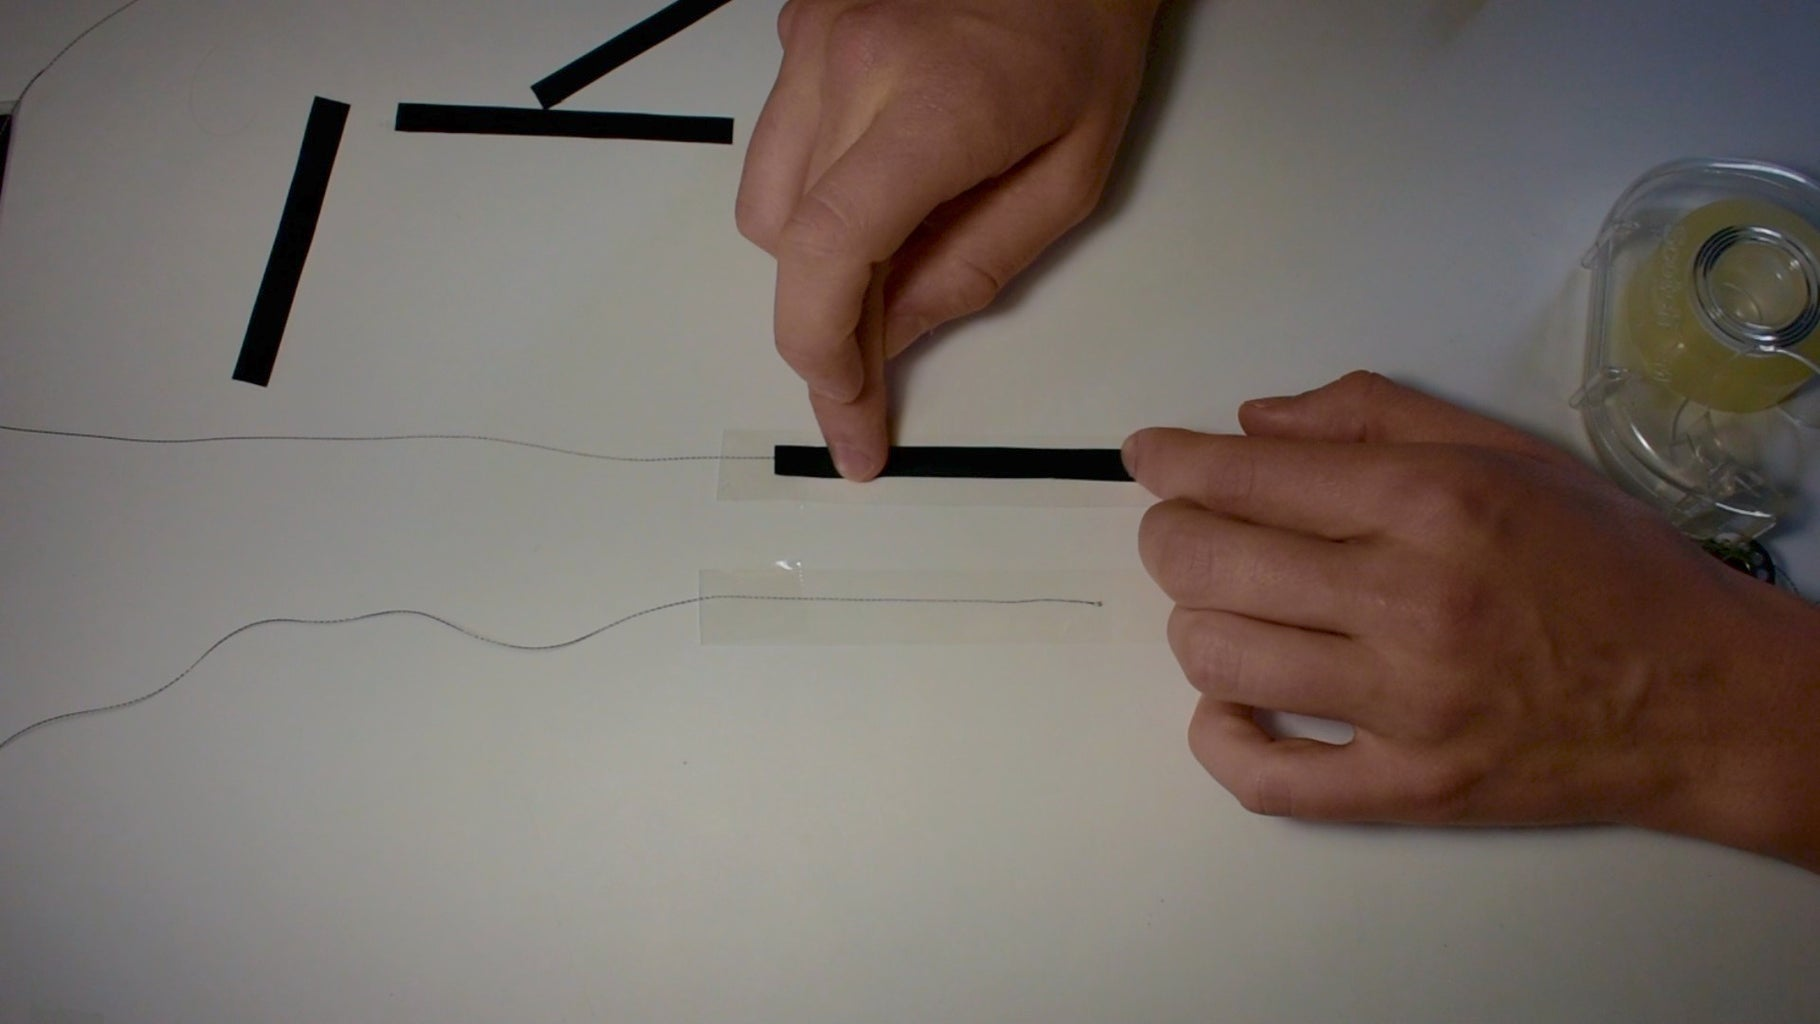 Making the Flex Sensors